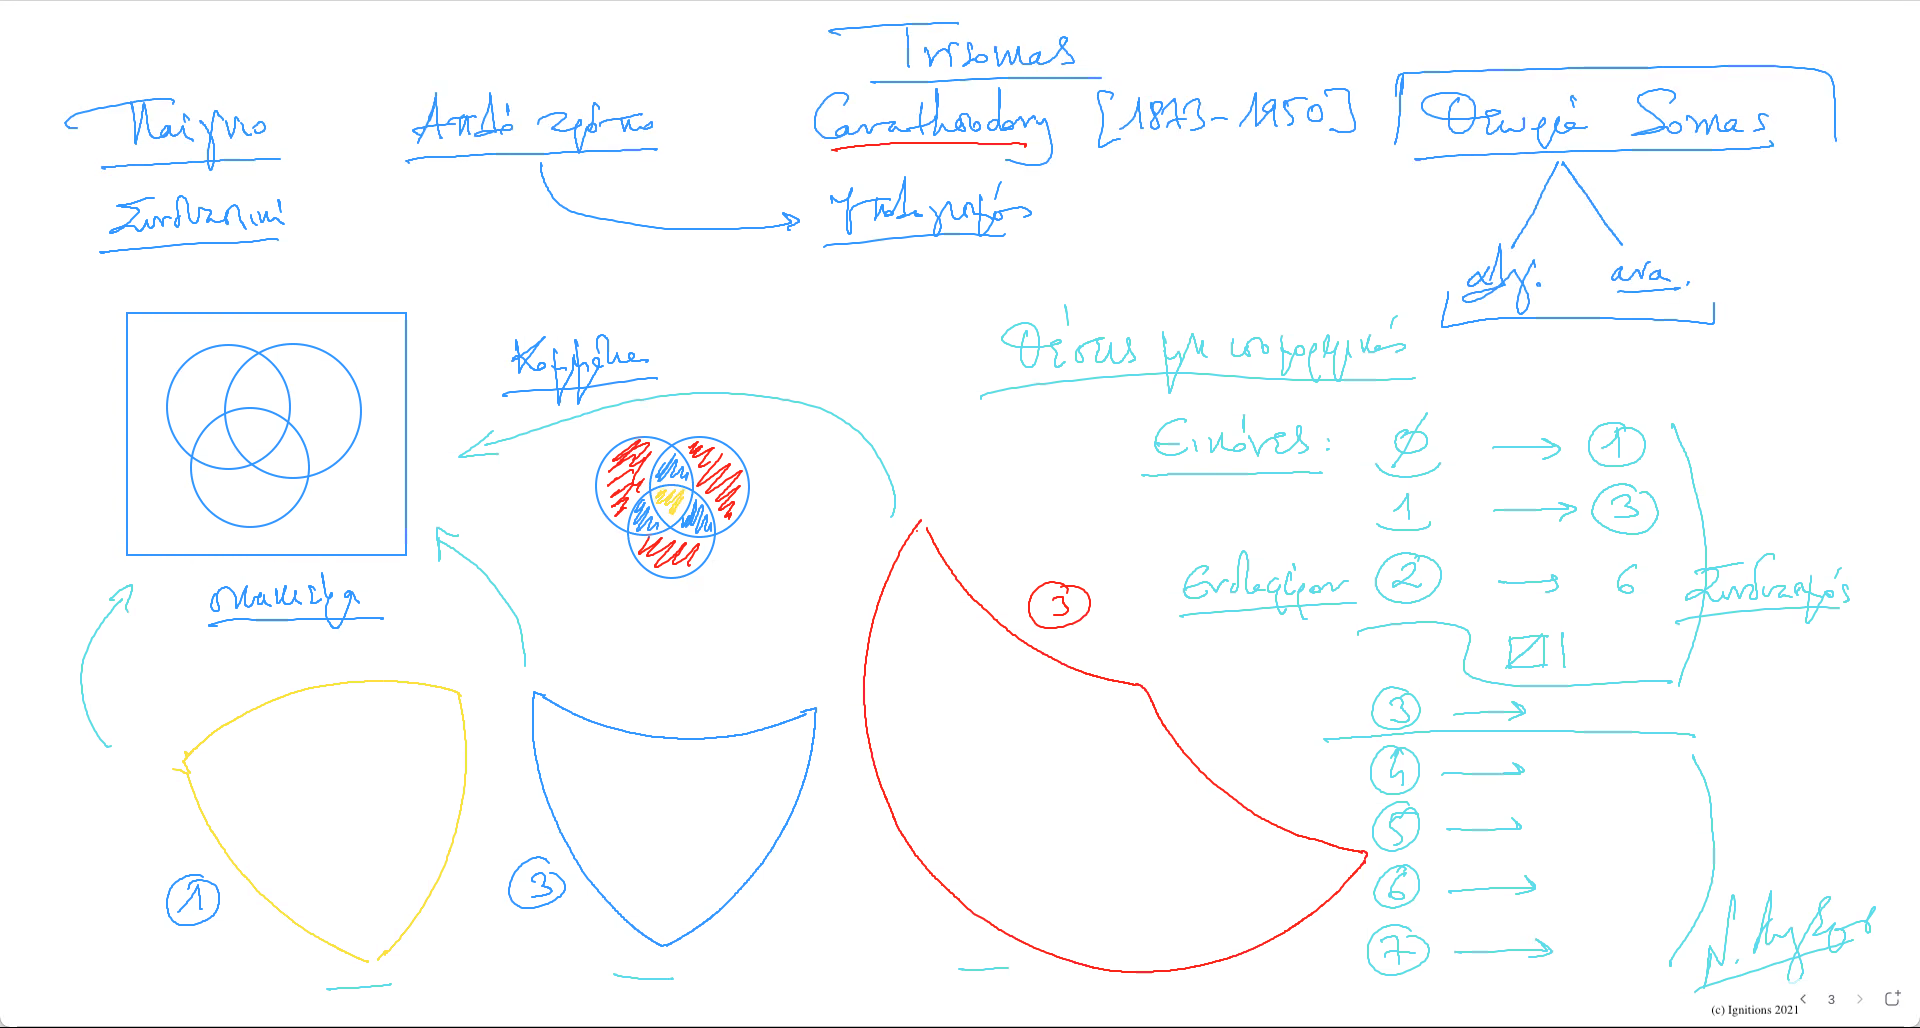 61634 - e-Μάθημα: Παρουσίαση του παιγνίουTrisomas. (Dessin)